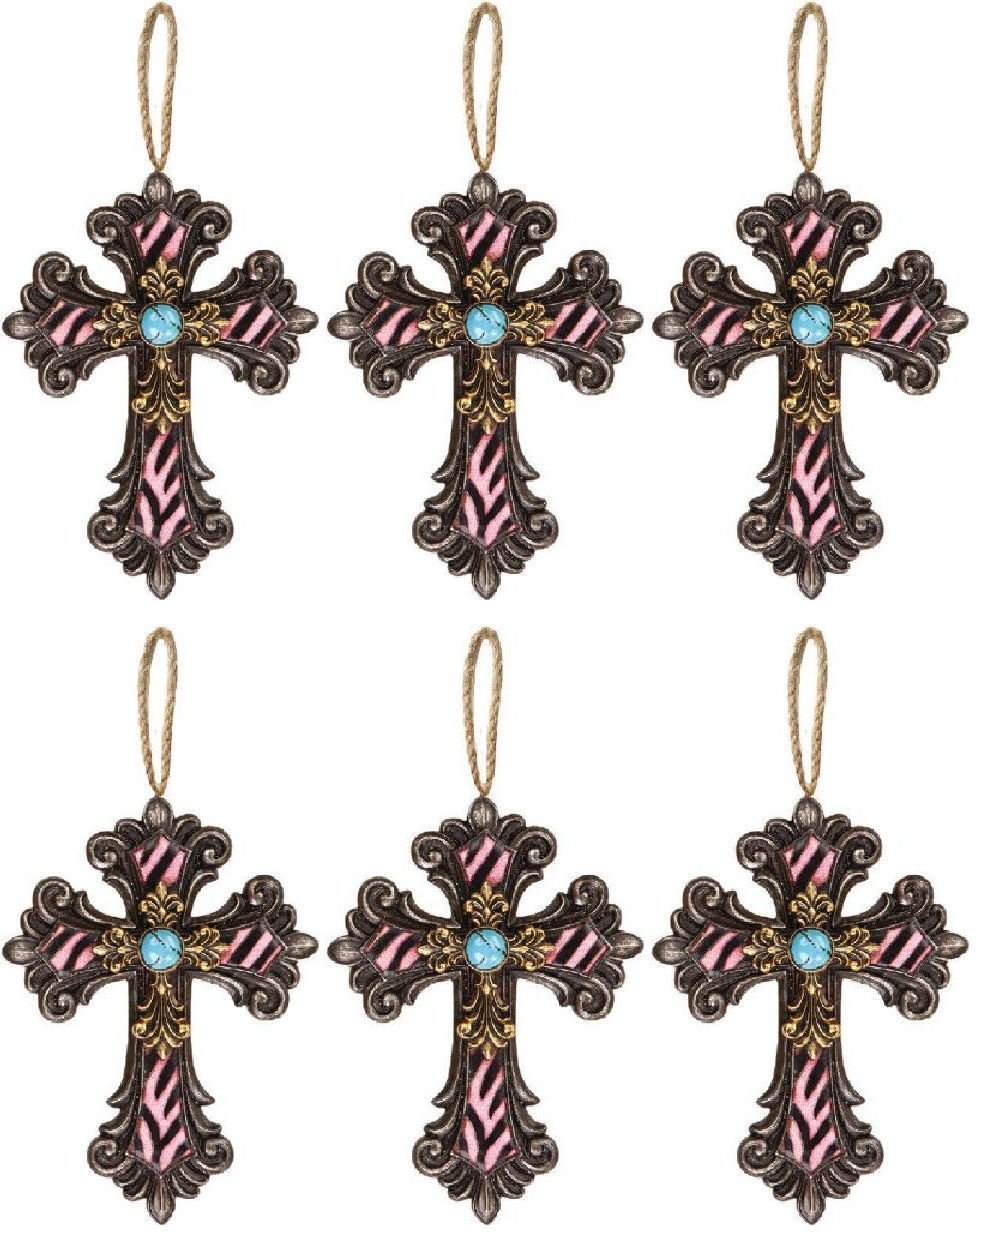 Manual Woodworker & Weavers Divine Zebra Cross DÃcor/Ornaments, 6.5-Inch, Pink, Set of 6